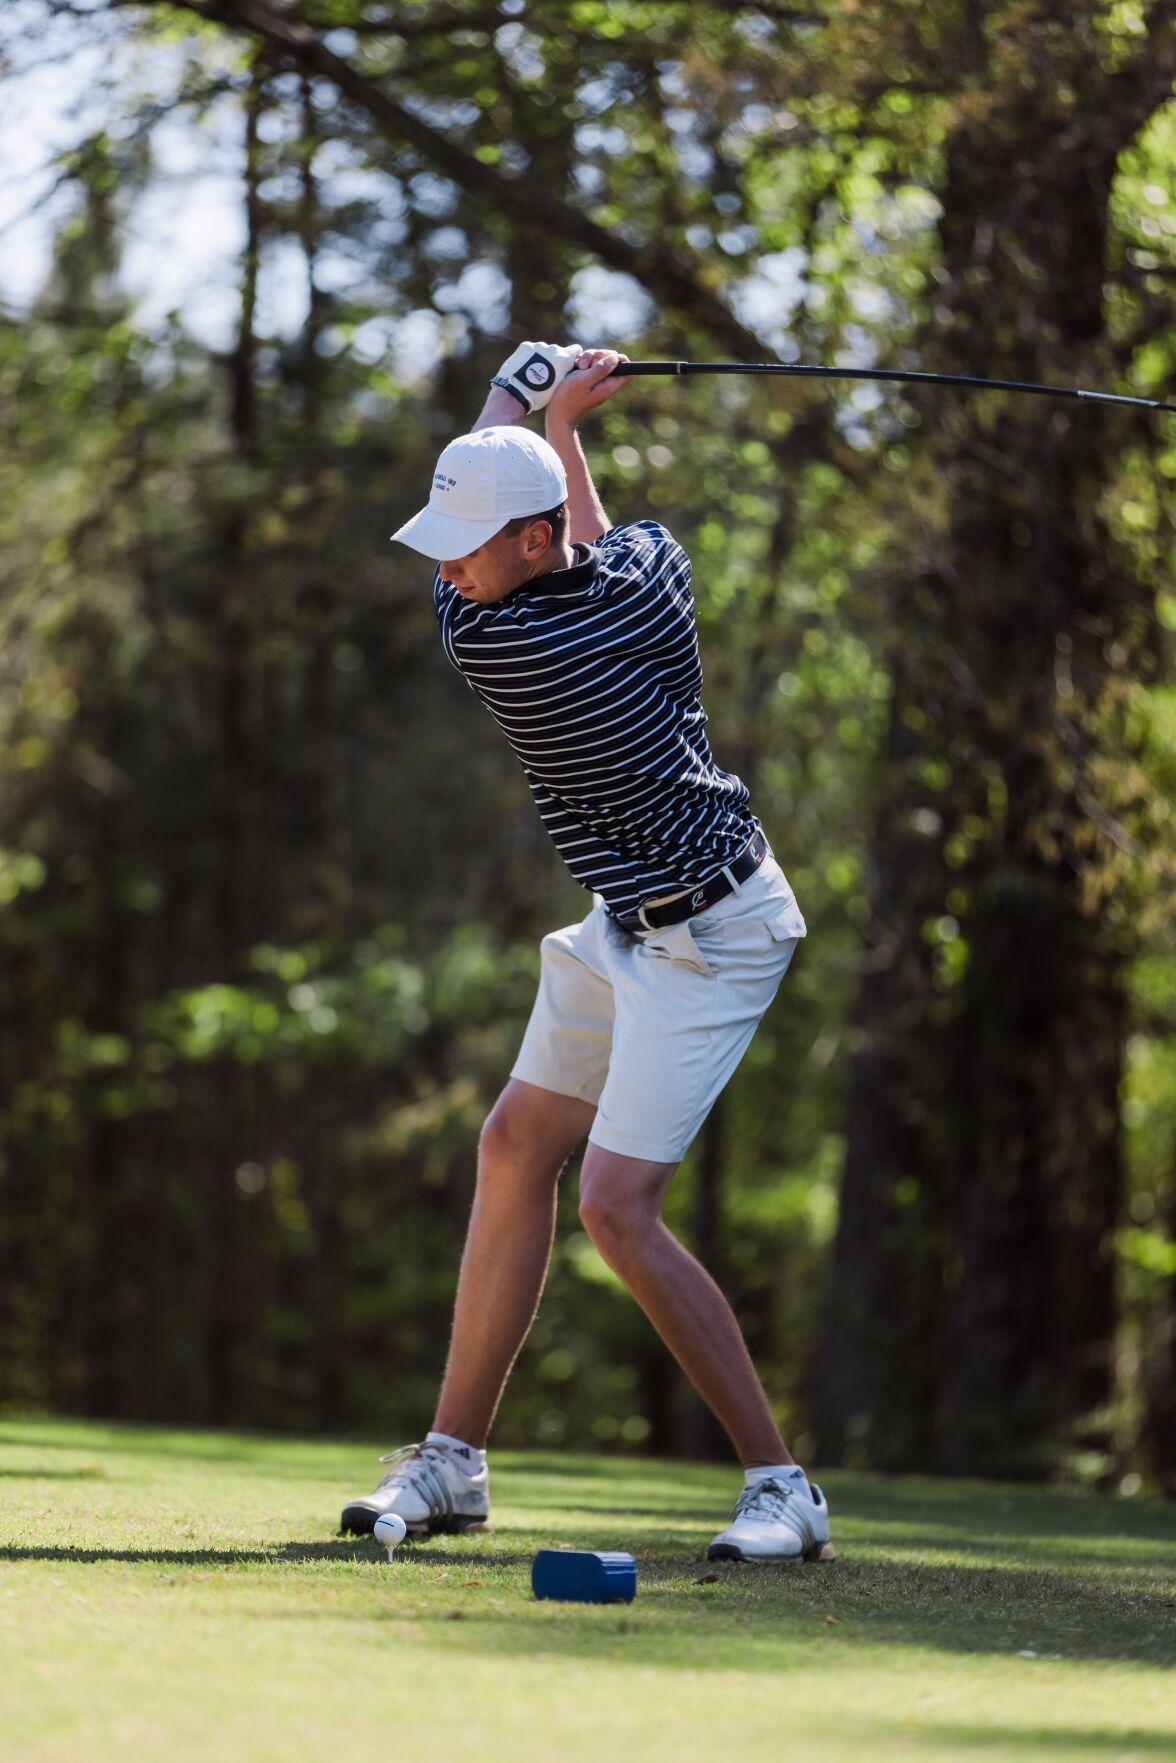 Rome Wolves Golf - Hogan Ingram winds up for a swing